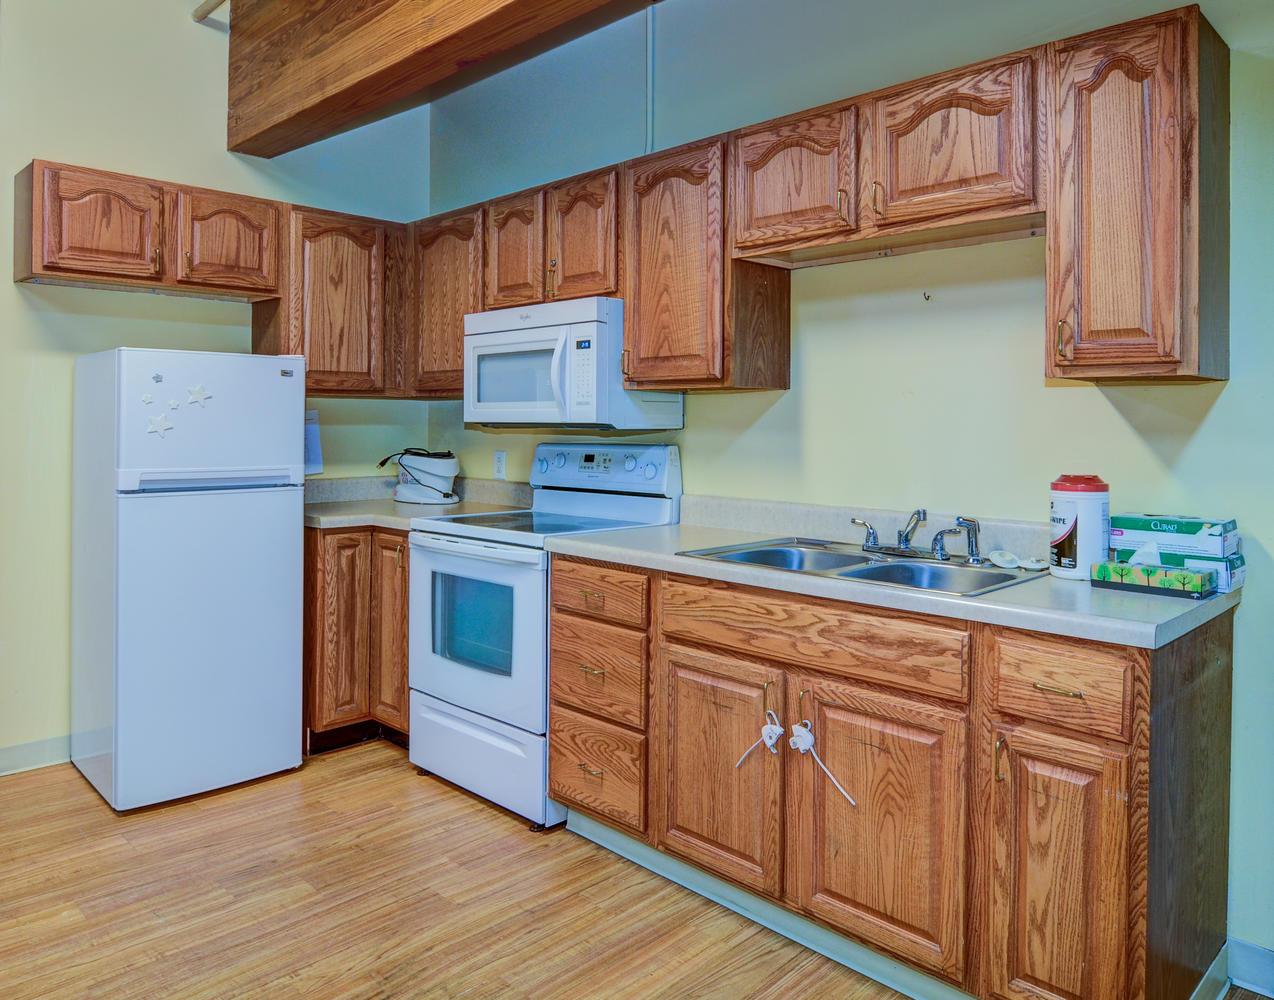 Kitchen area in Stonerise Parkersburg Rehabilitation room